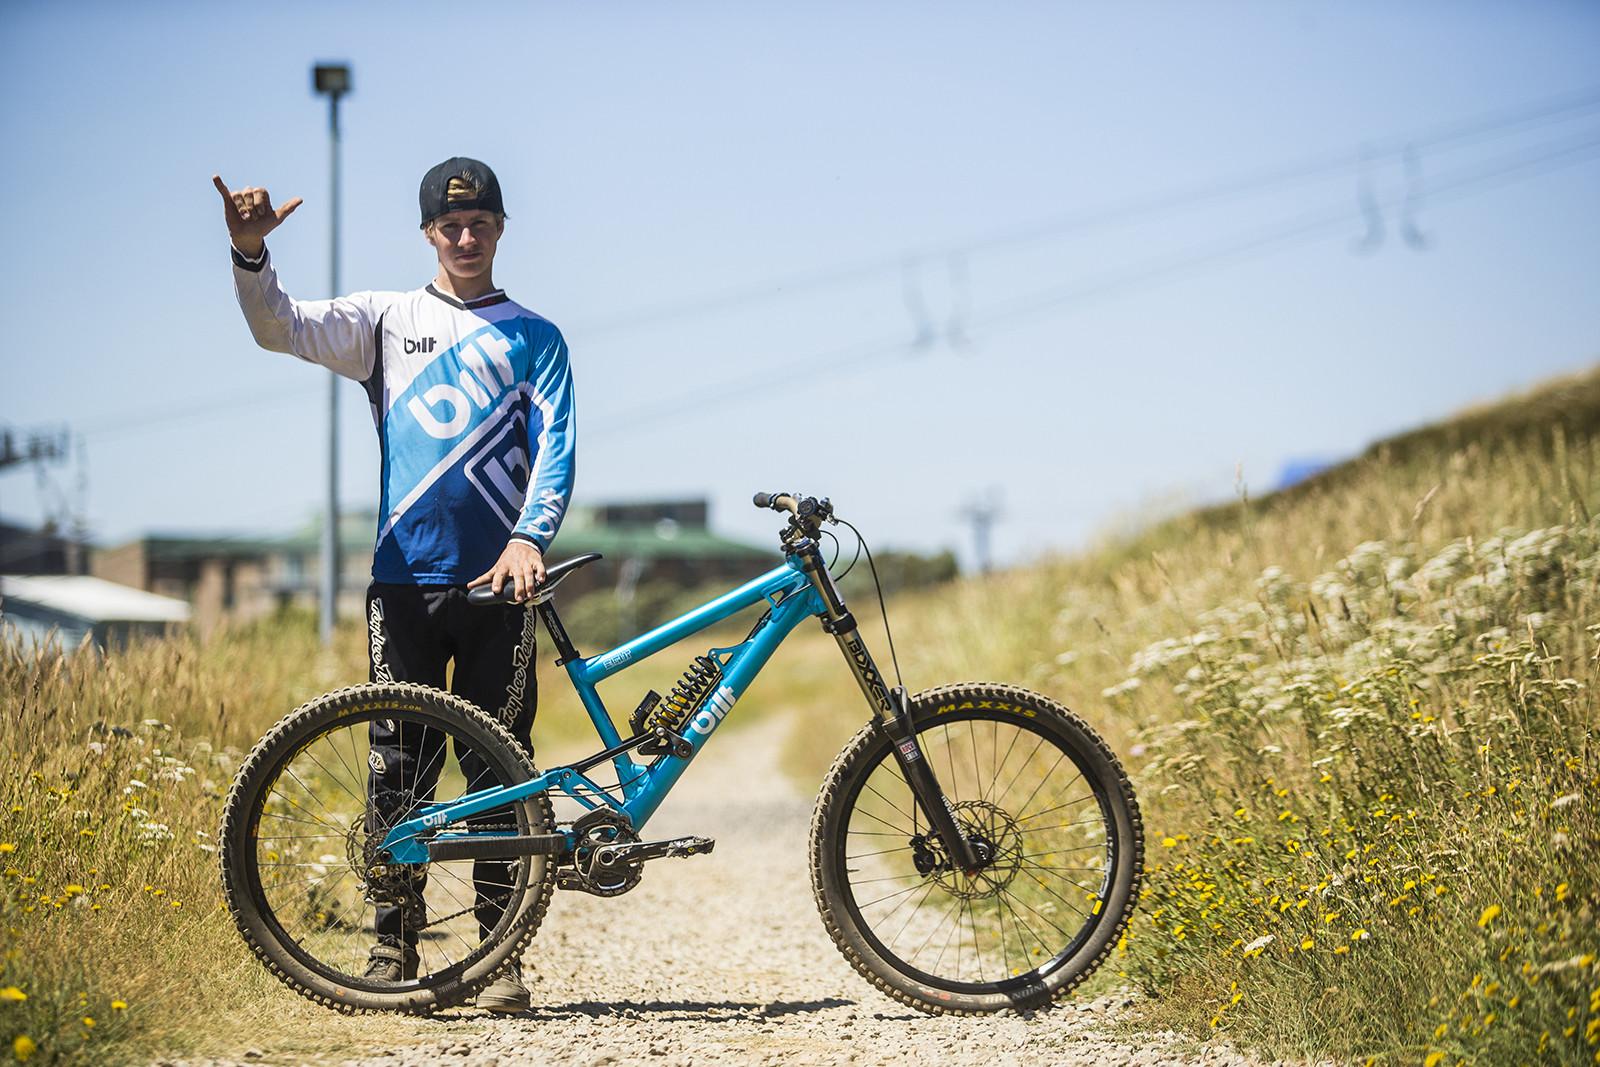 Pro Bike Check: Luke Ellison's Bilt 8 Downhill Bike - Pro Bike Check: Luke Ellison's Bilt 8 Downhill Bike - Mountain Biking Pictures - Vital MTB